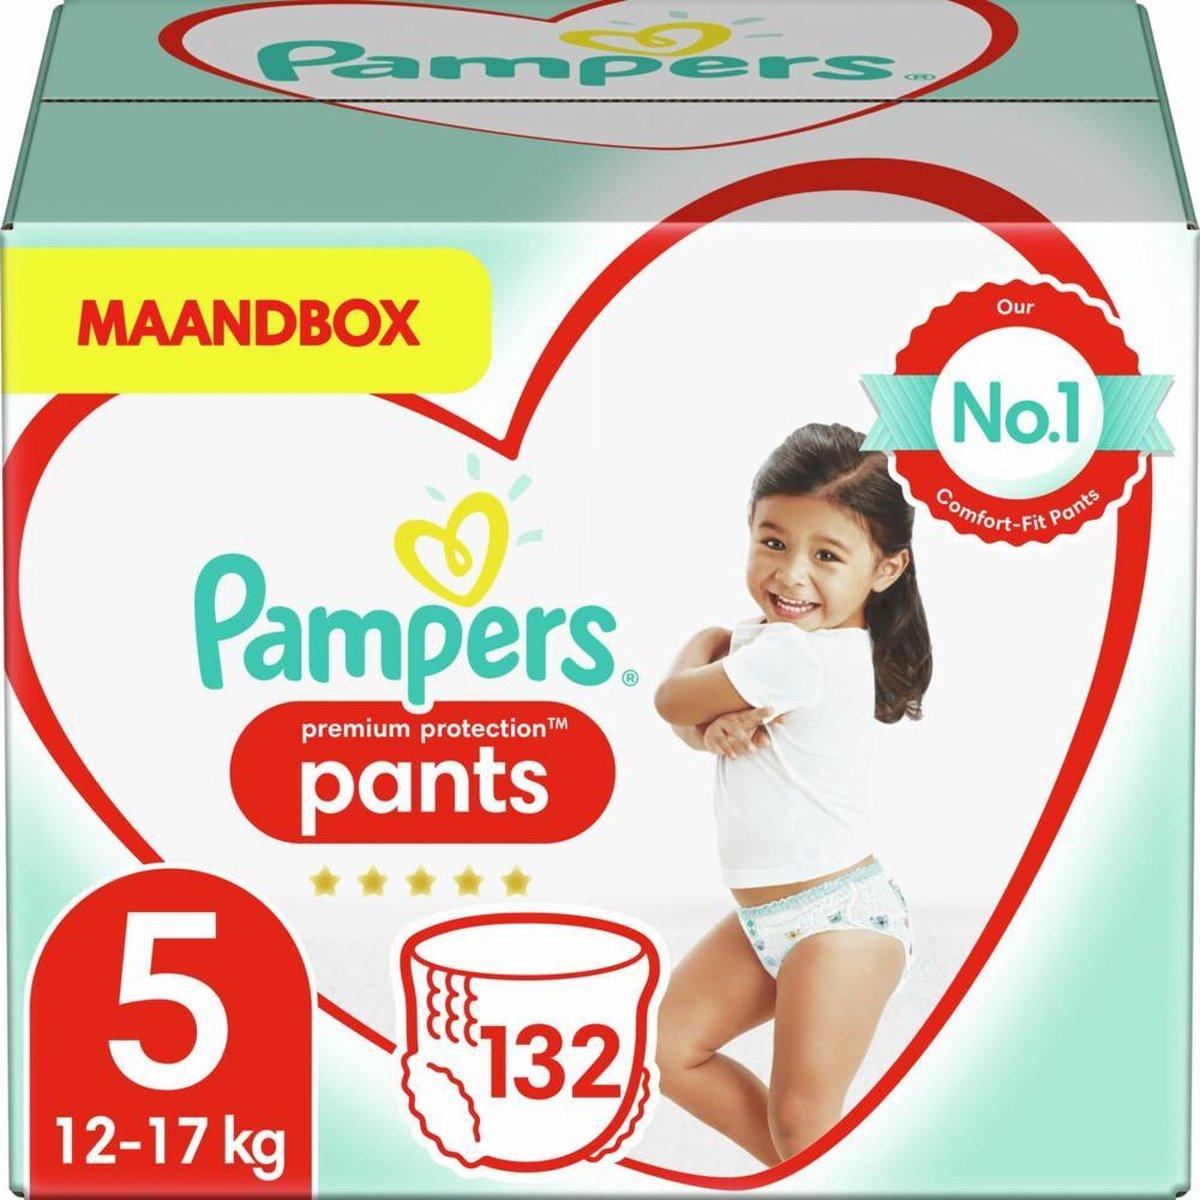 Pampers Premium Protection Active Fit Luierbroekjes - Maat 5 (12-17 kg) - 132 Stuks - Maandbox